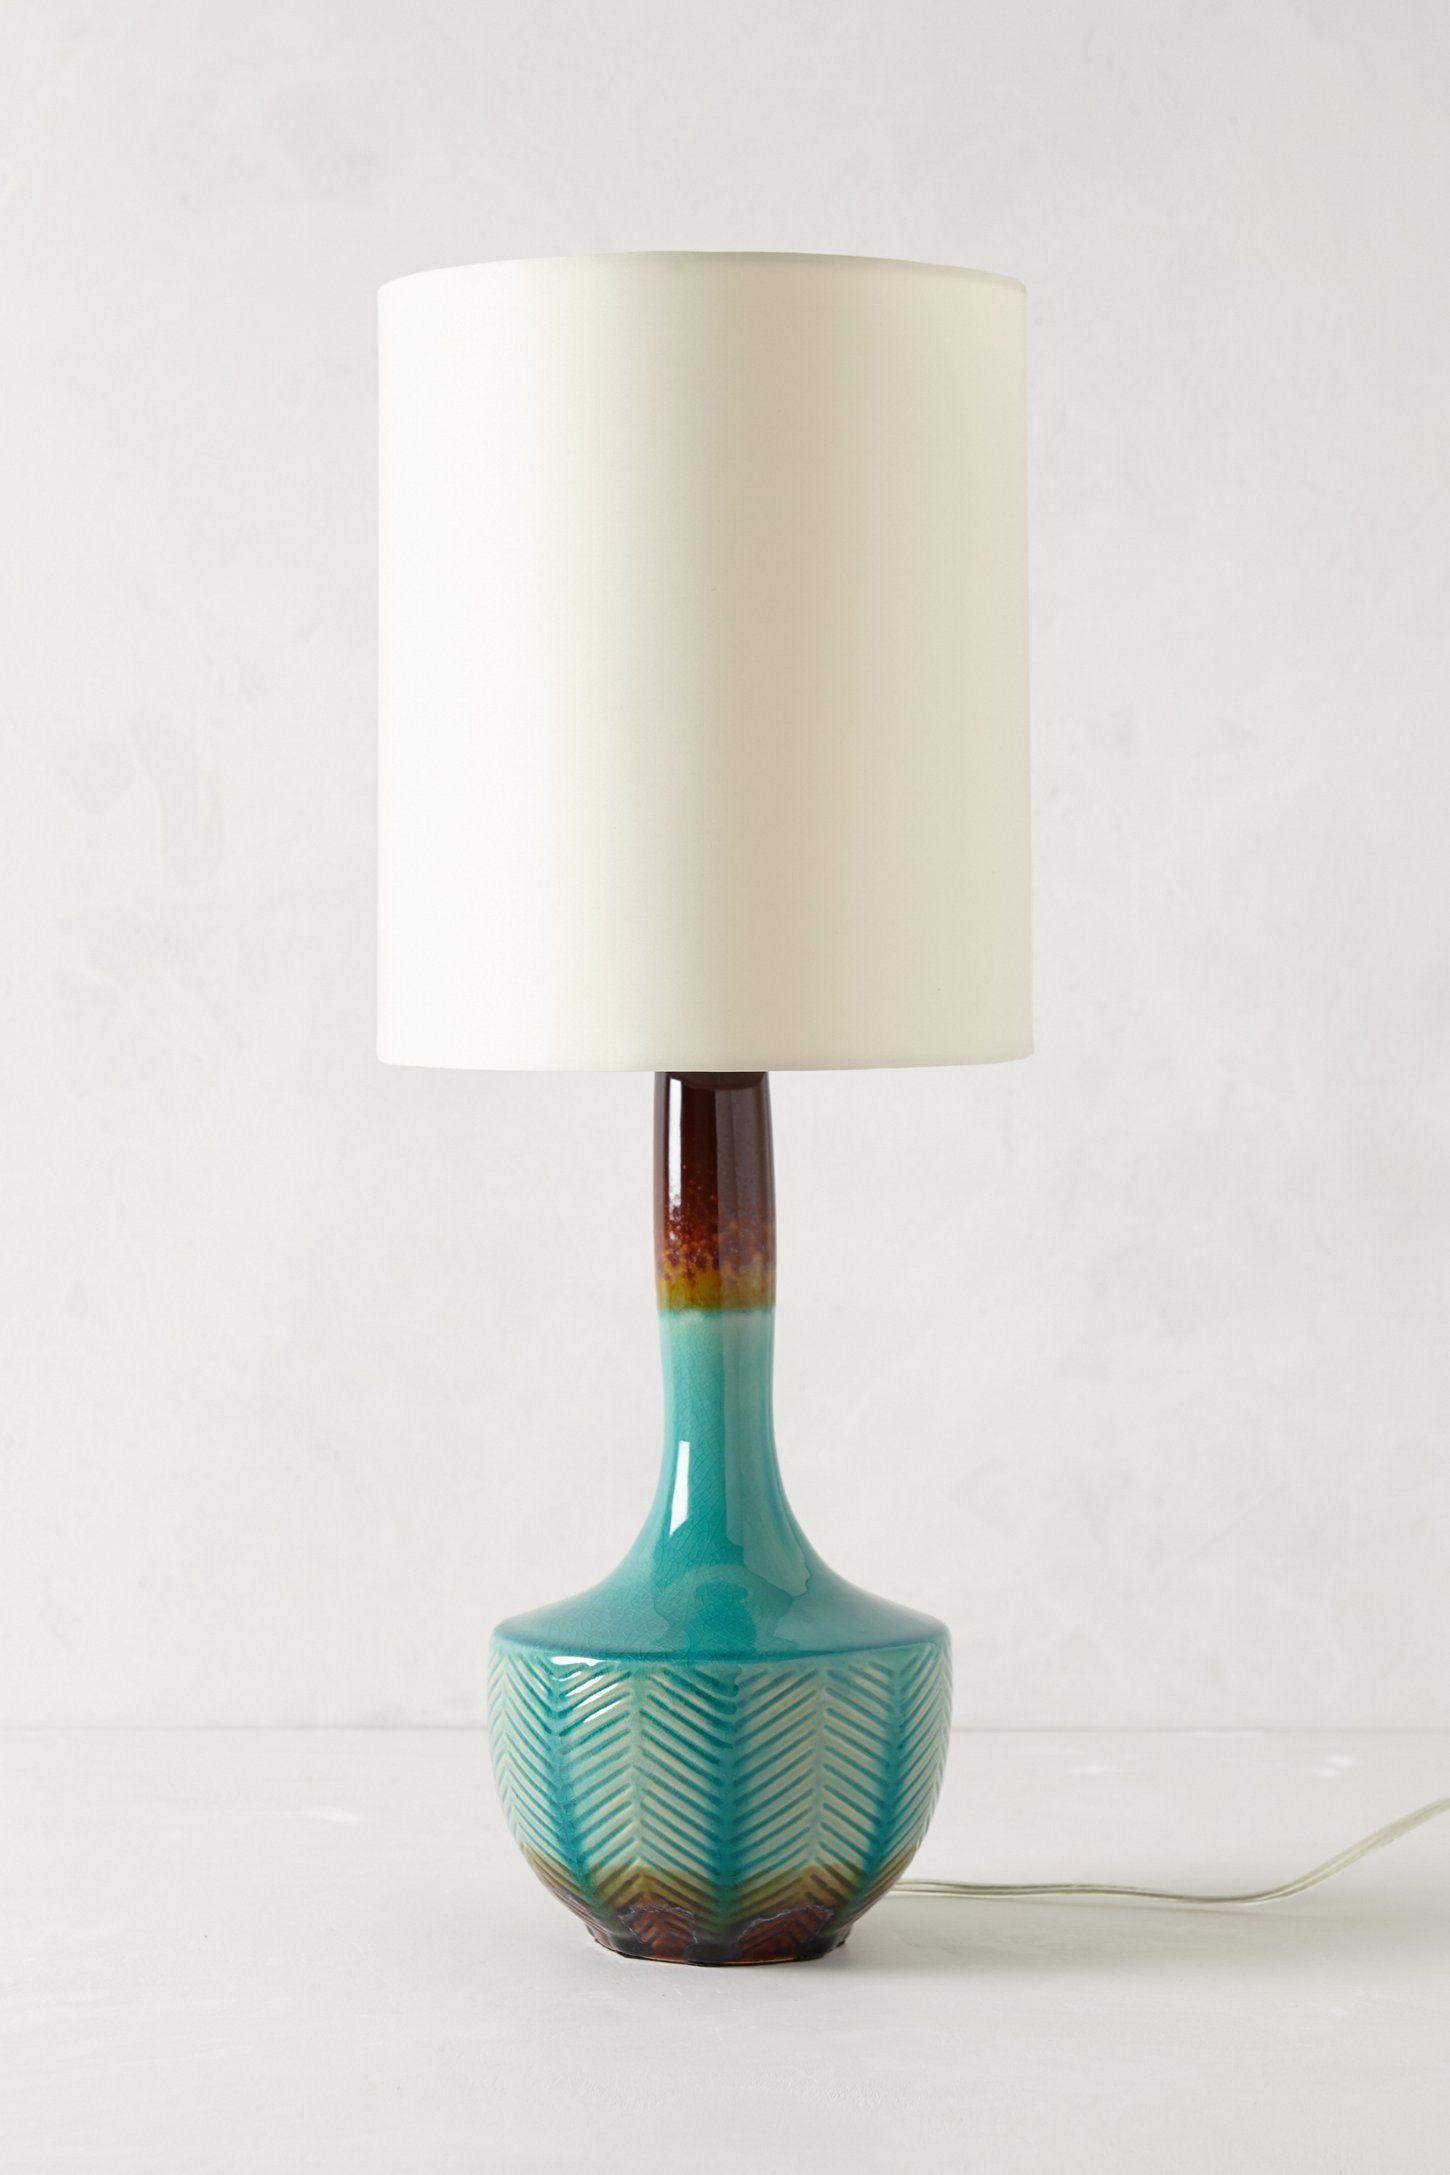 Fern Fossil Lamp Ensemble Home lighting, Unique table